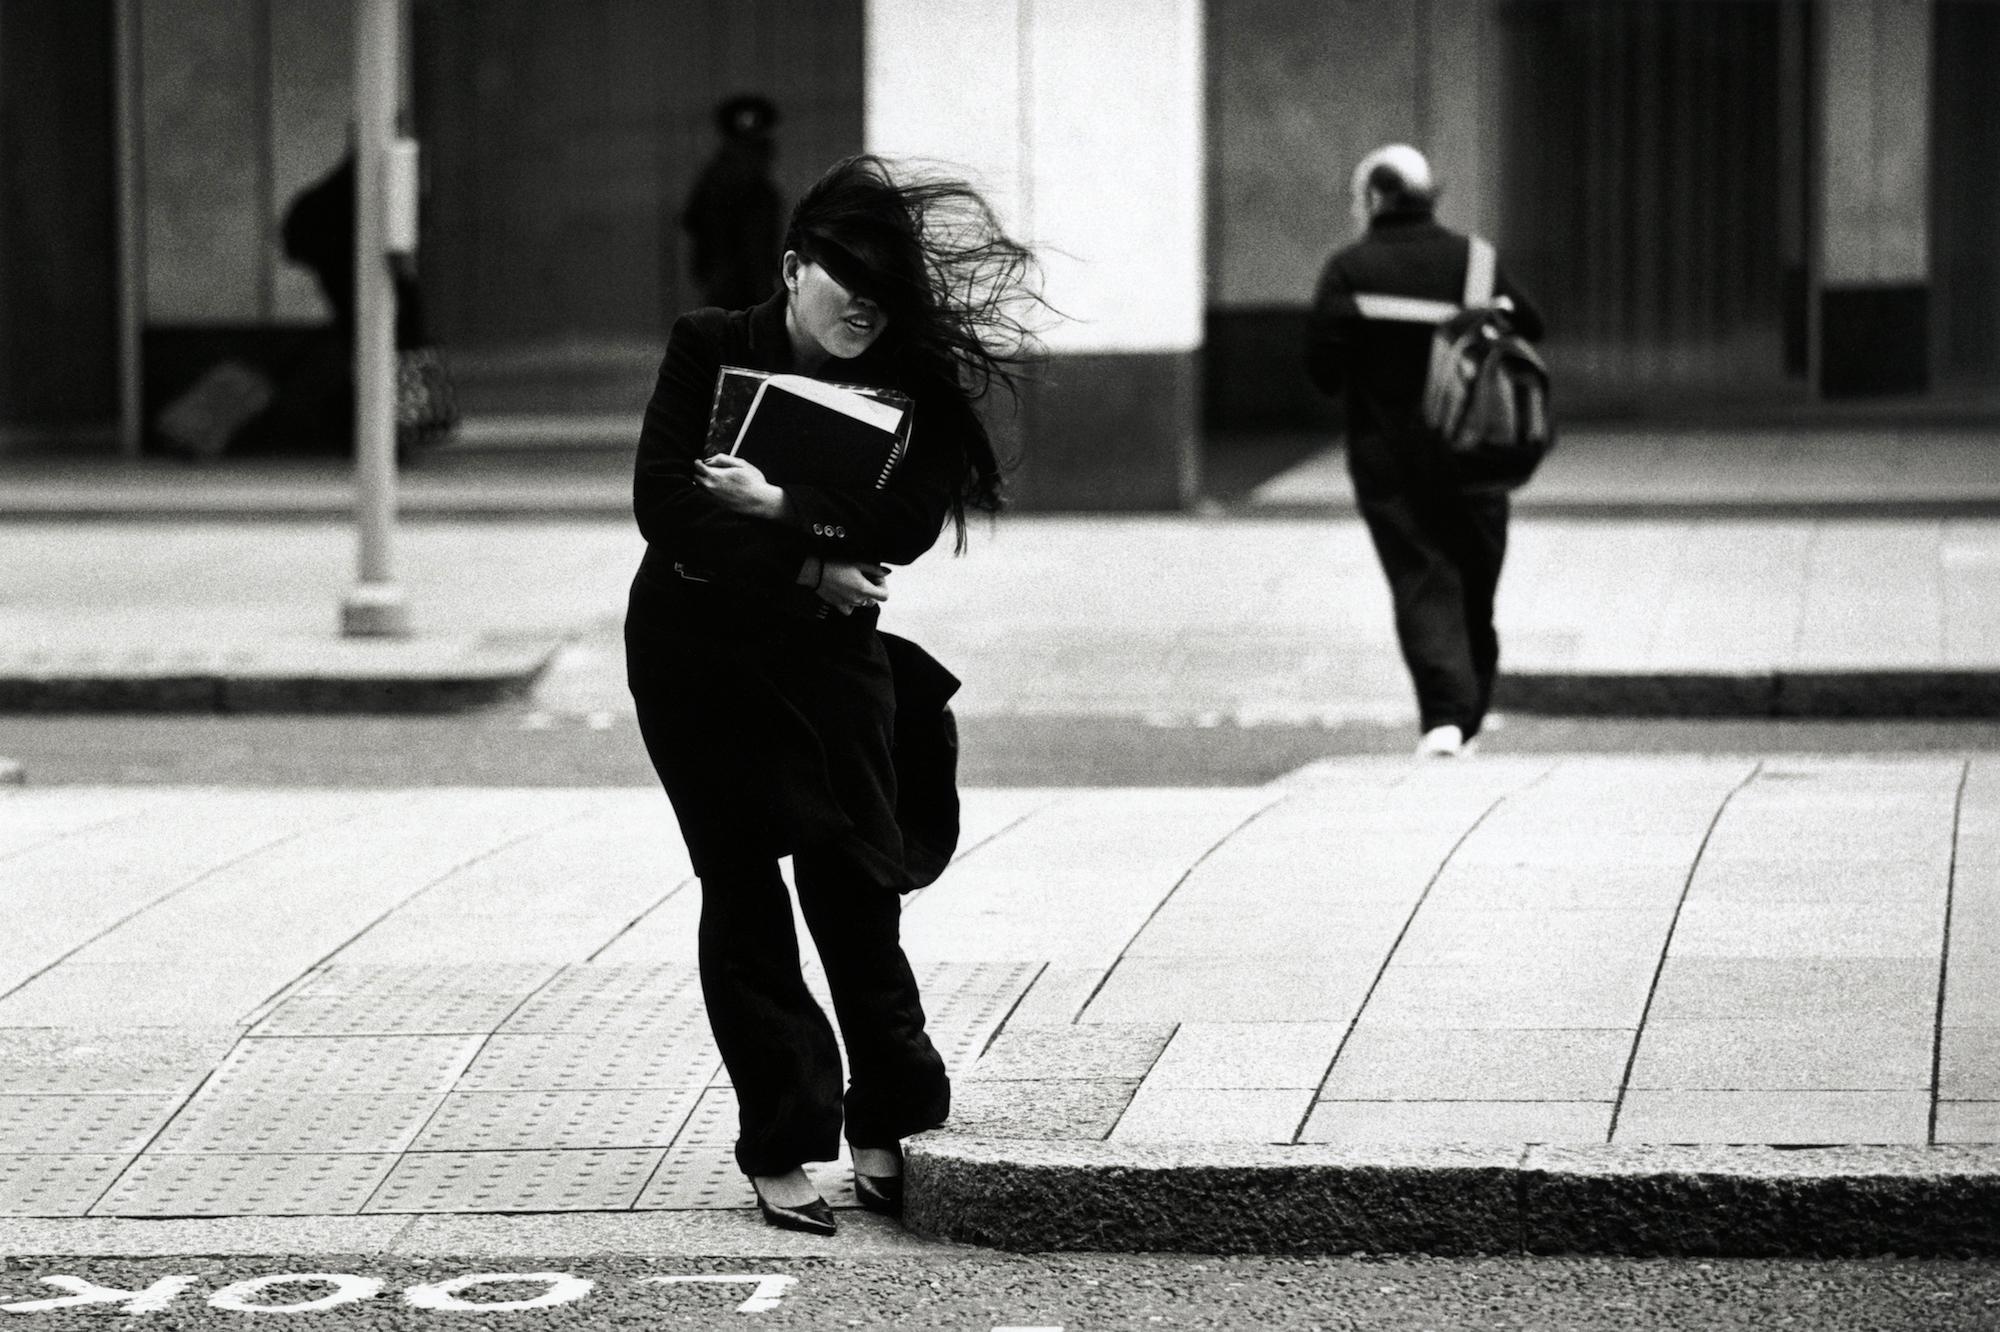 walter_rothwell_photography_0007.jpg